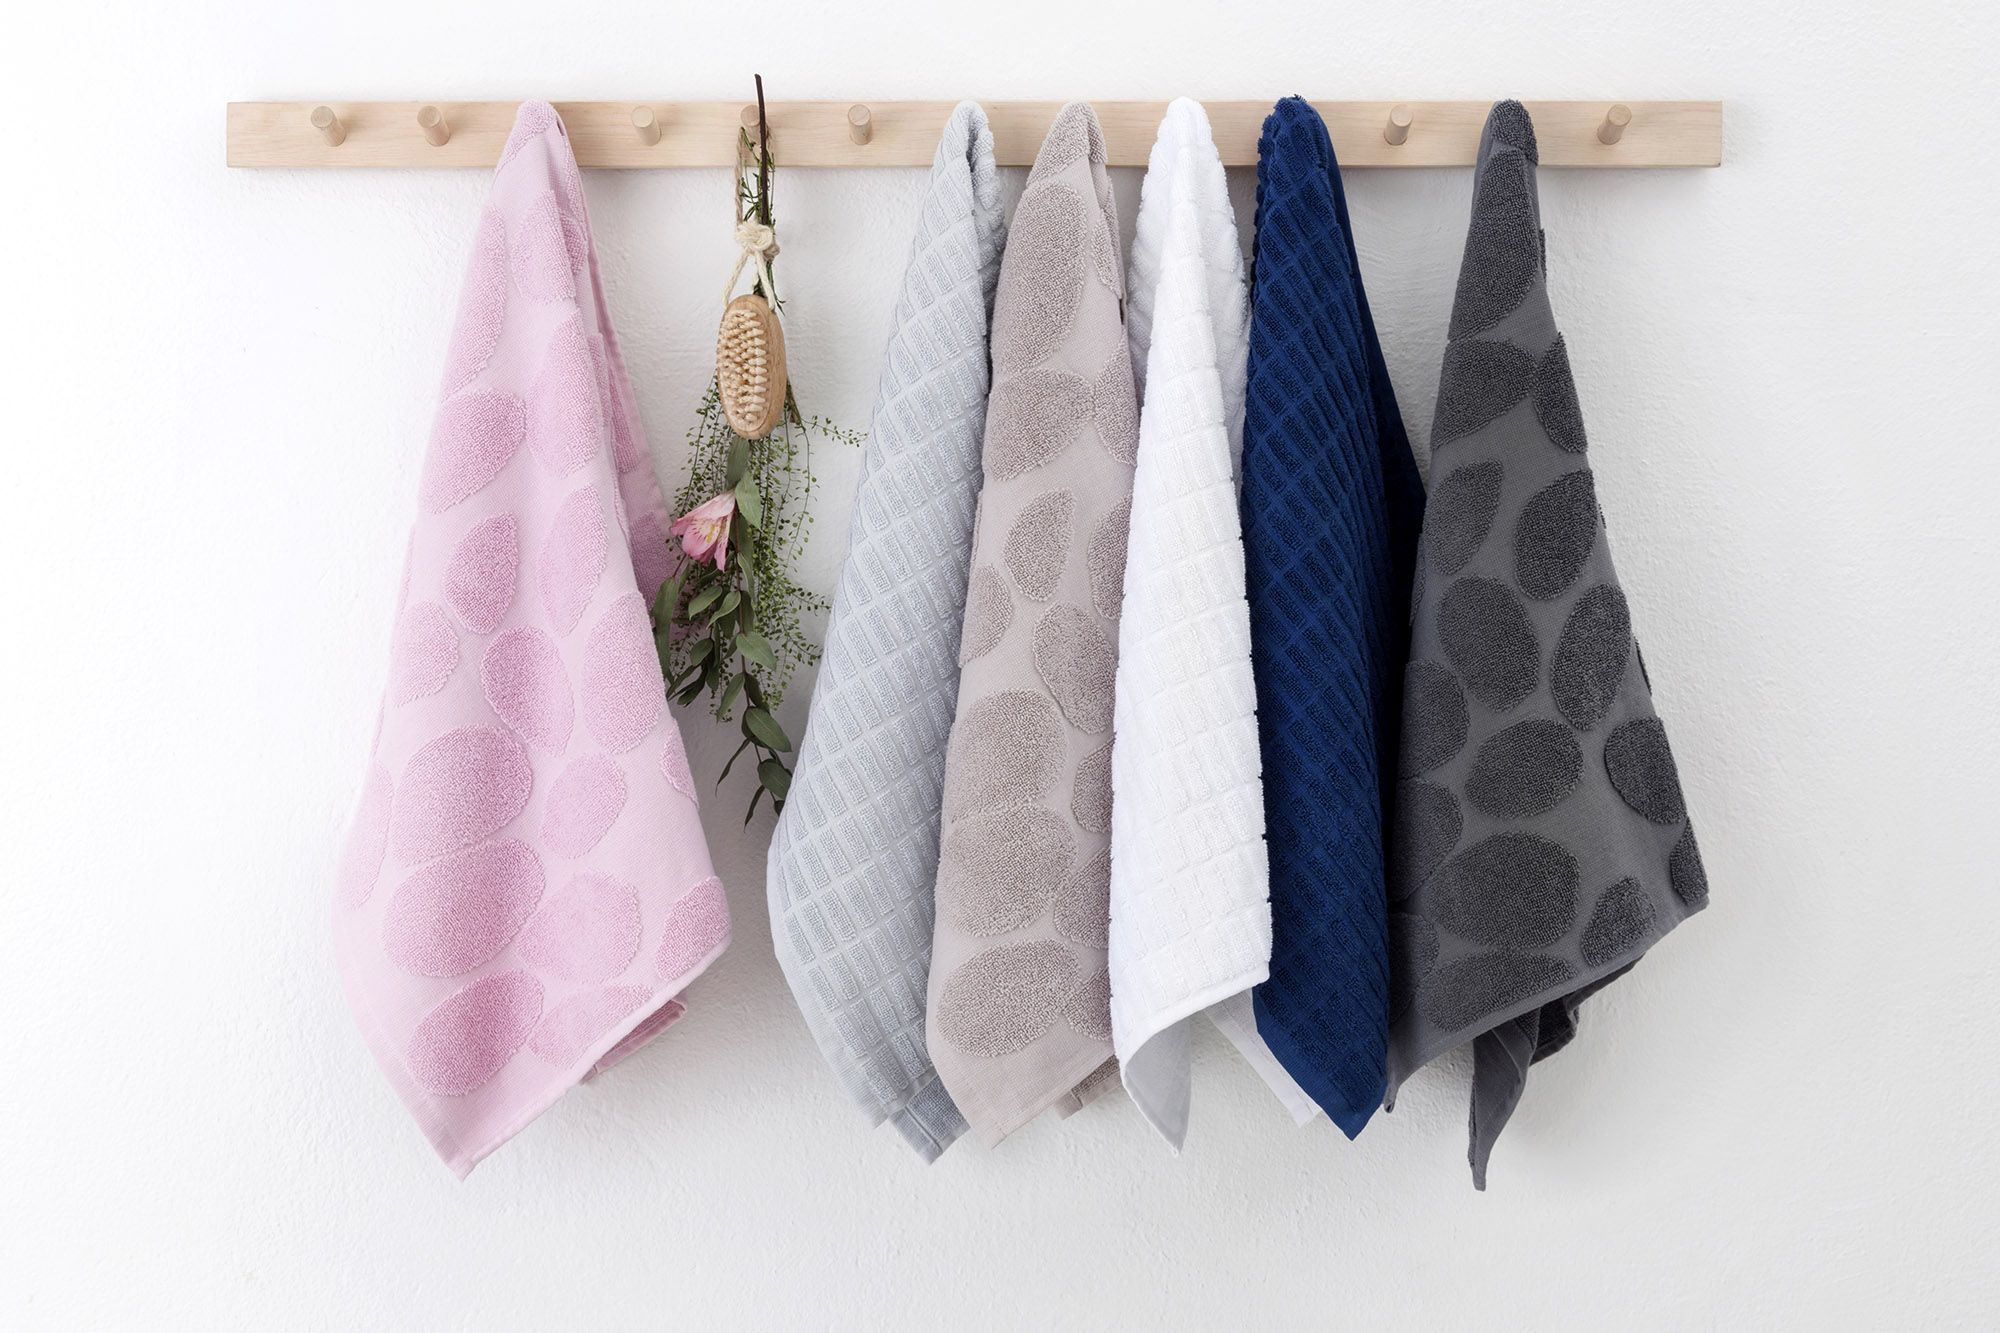 Tippa and Tokka towels by Riina Kuikka